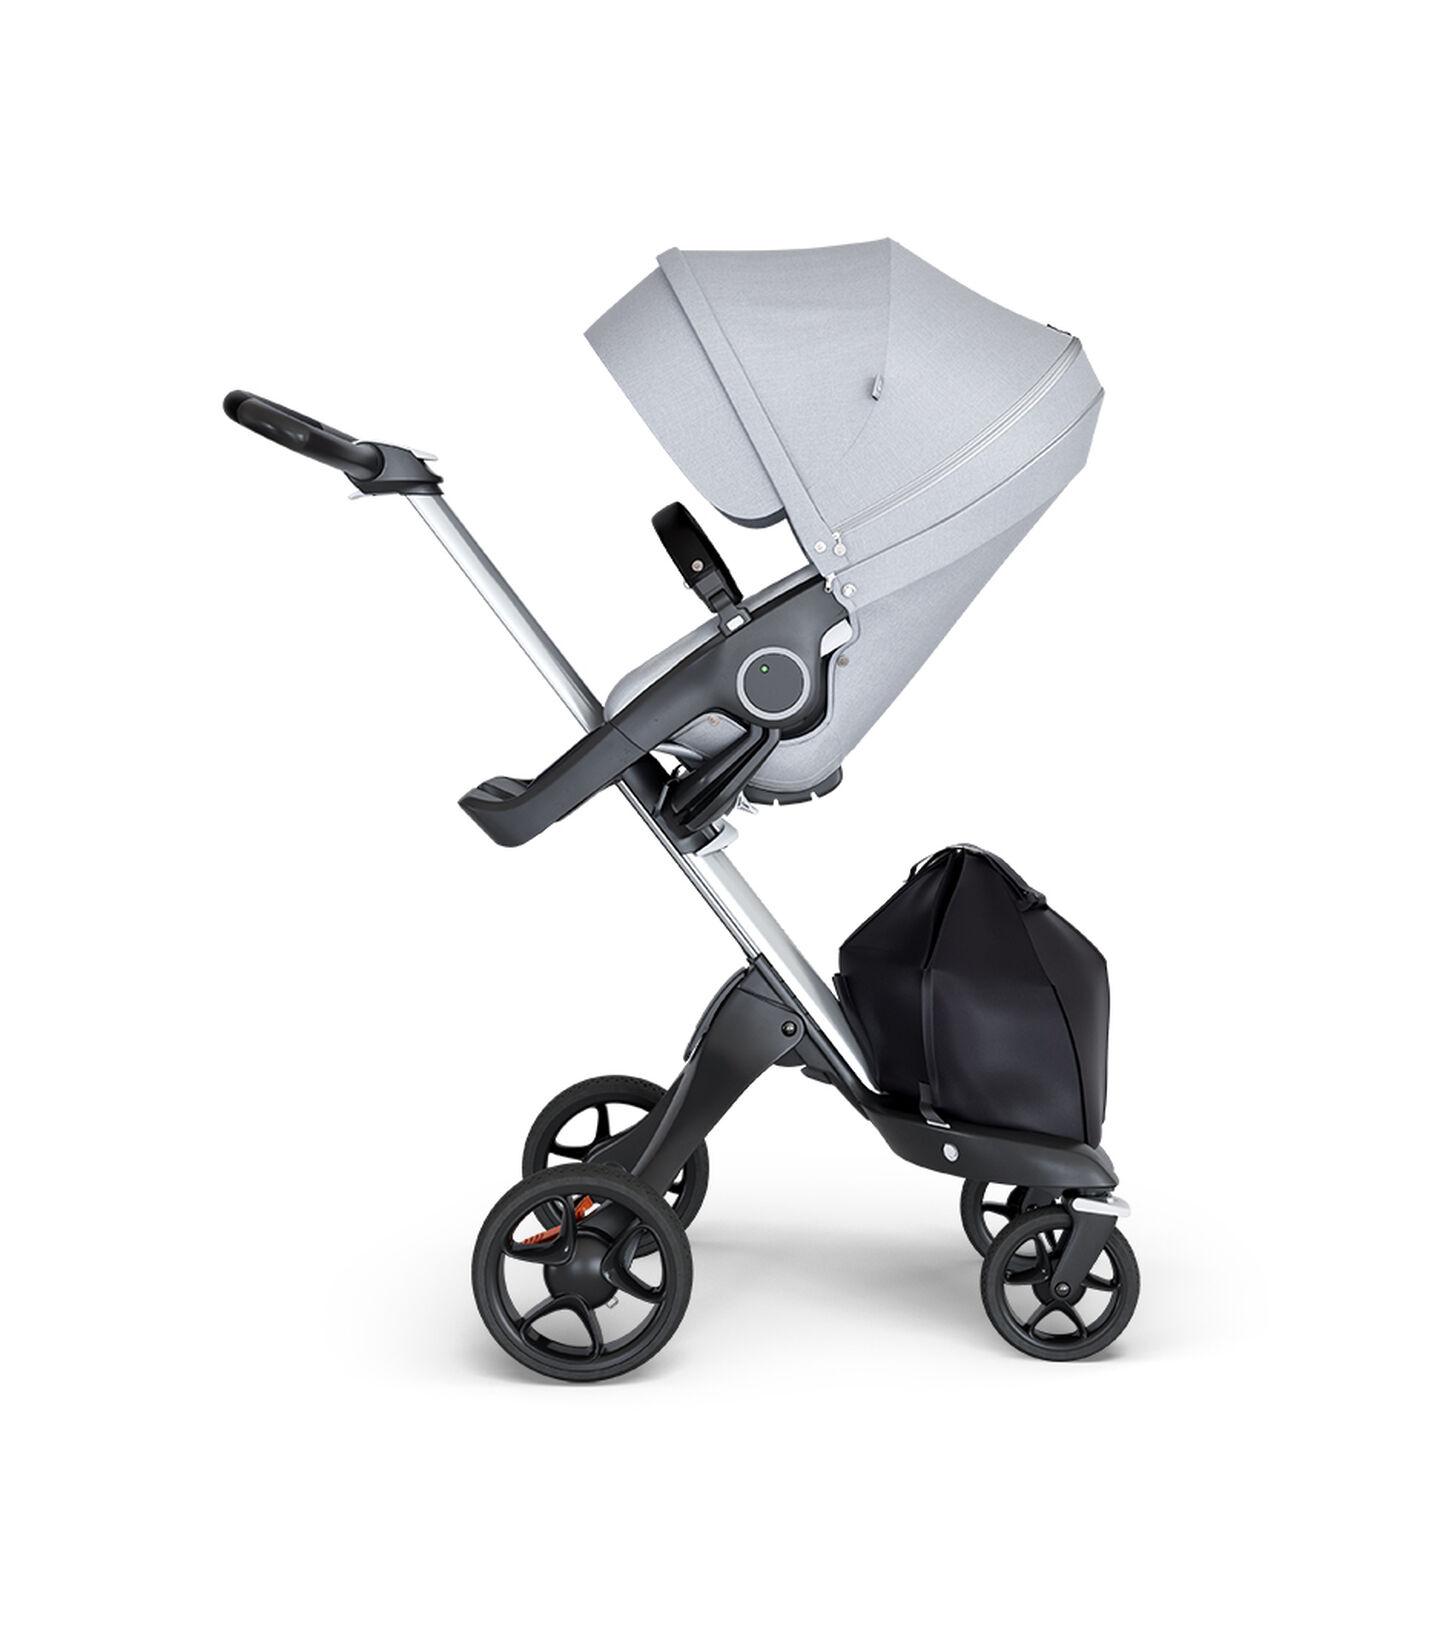 Stokke® Xplory® wtih Silver Chassis and Leatherette Black handle. Stokke® Stroller Seat Grey Melange.